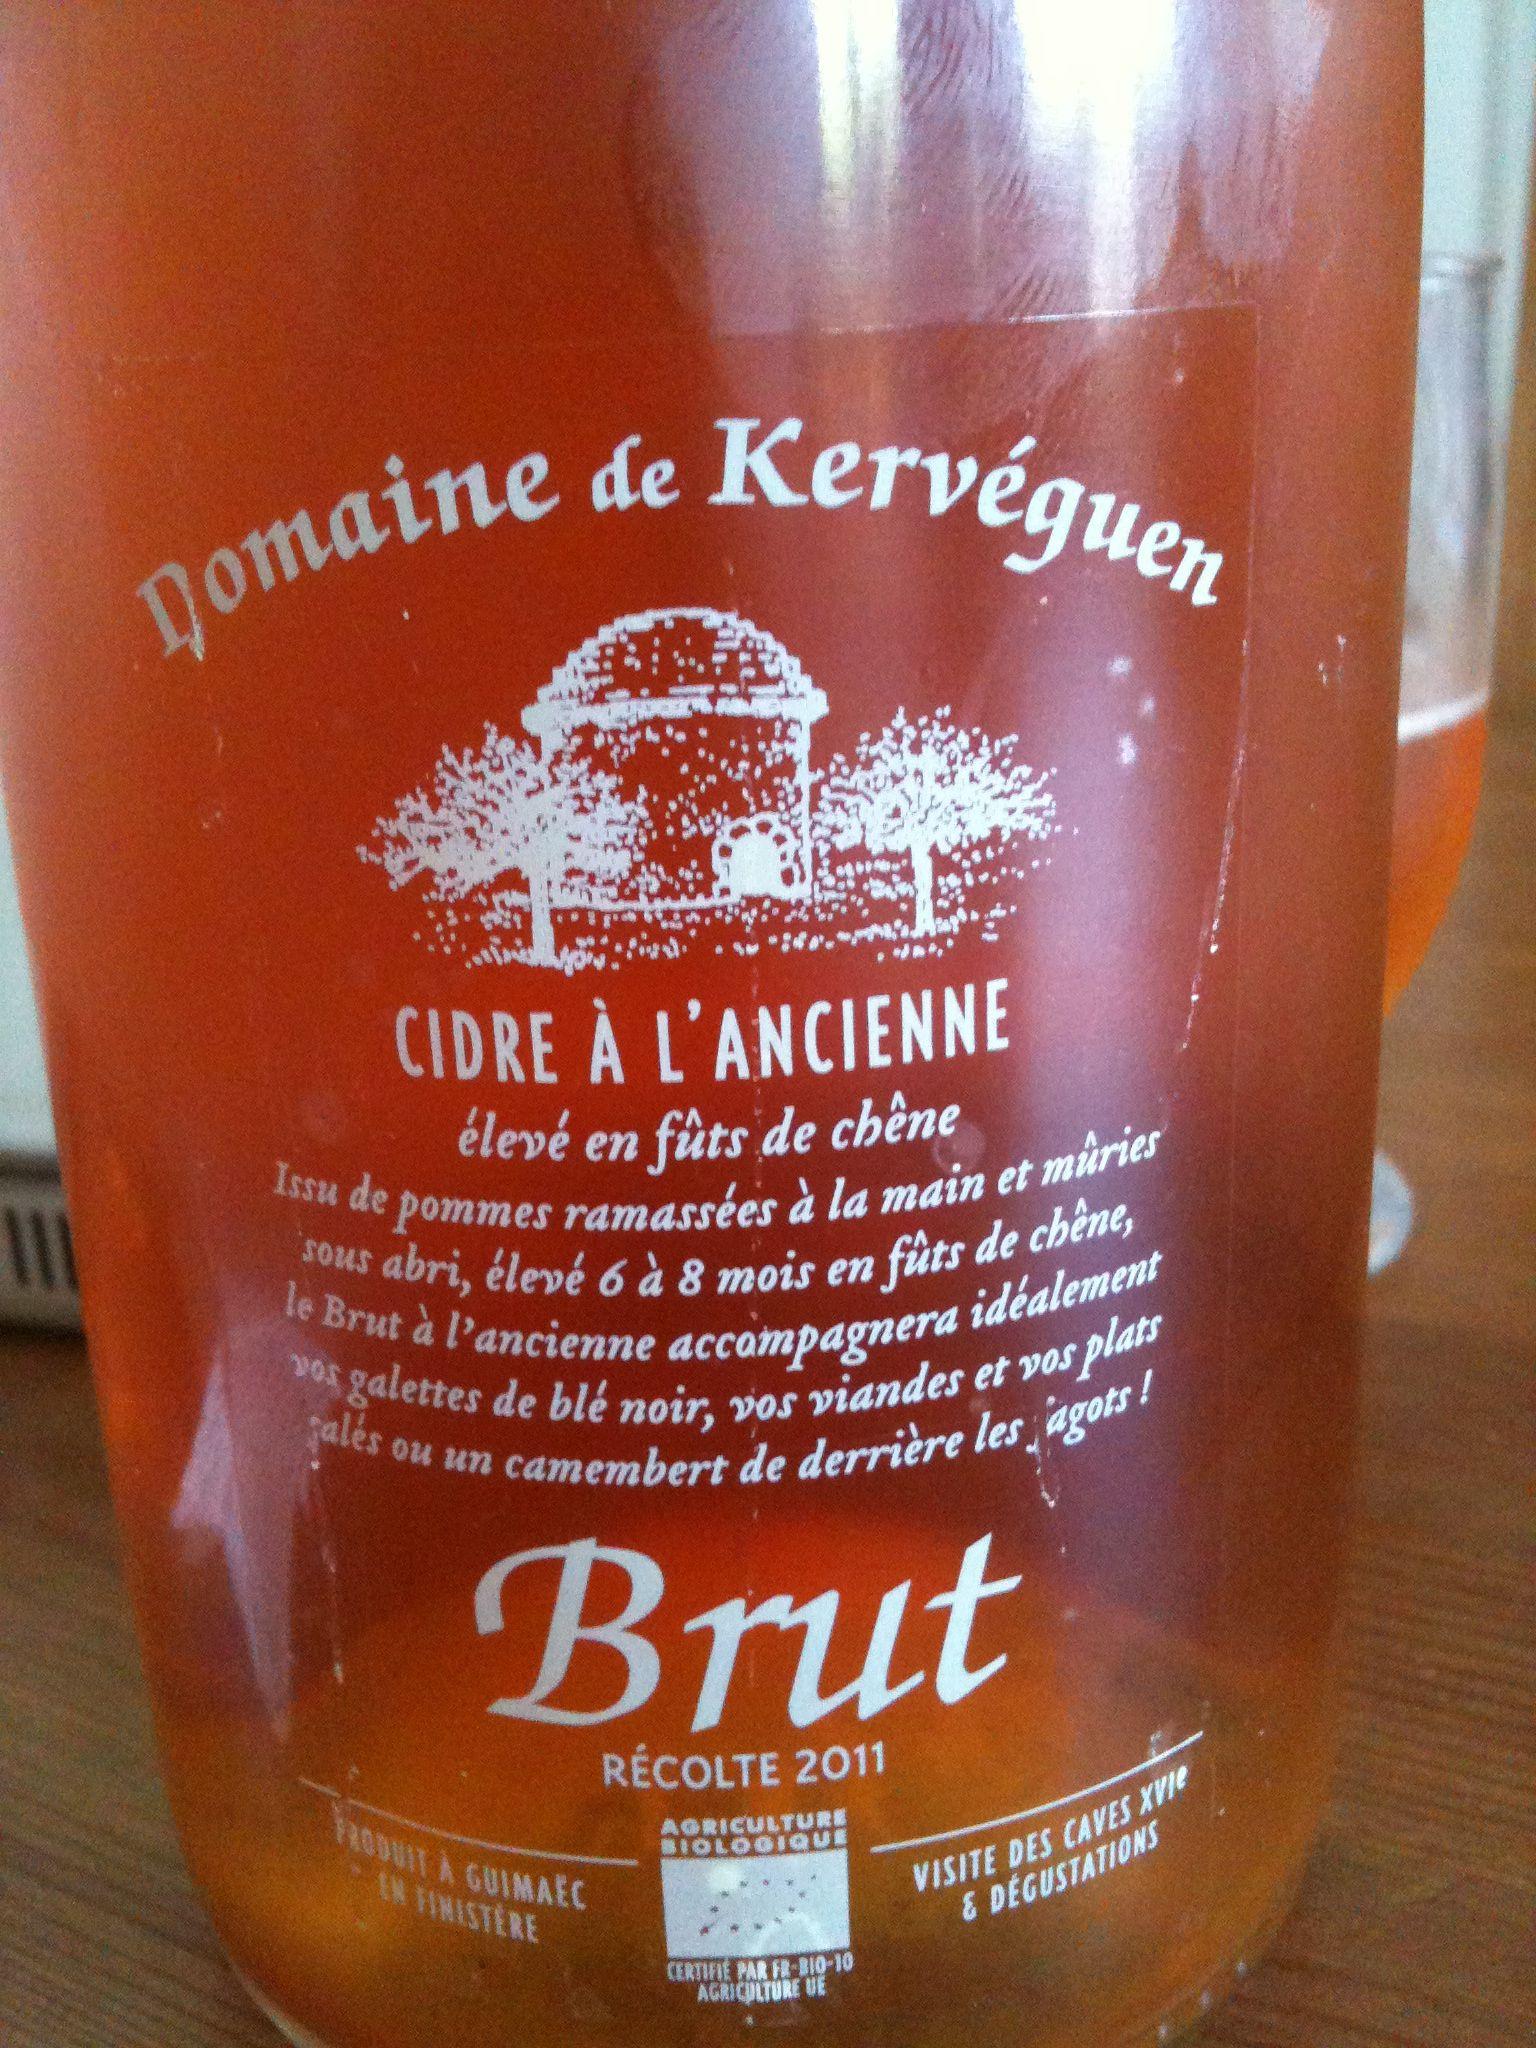 Eric Baron Cuvee Carpe Diem Fournisseur Officiel De L Elysee Cidre Breton Cidre Breton Cidre Ble Noir